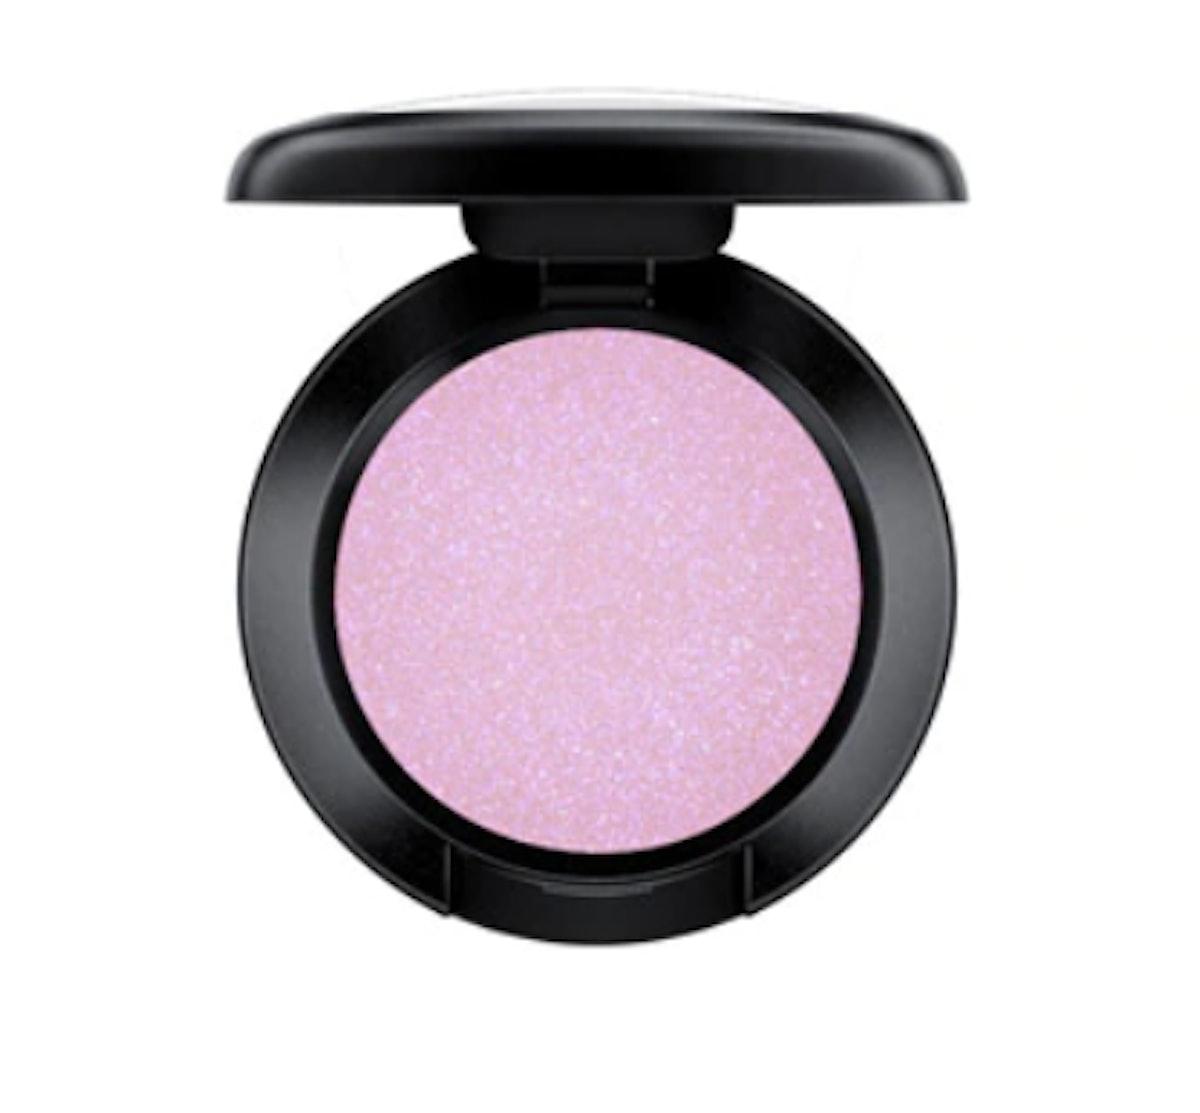 MAC Single Eyeshadow in #Humblebrag